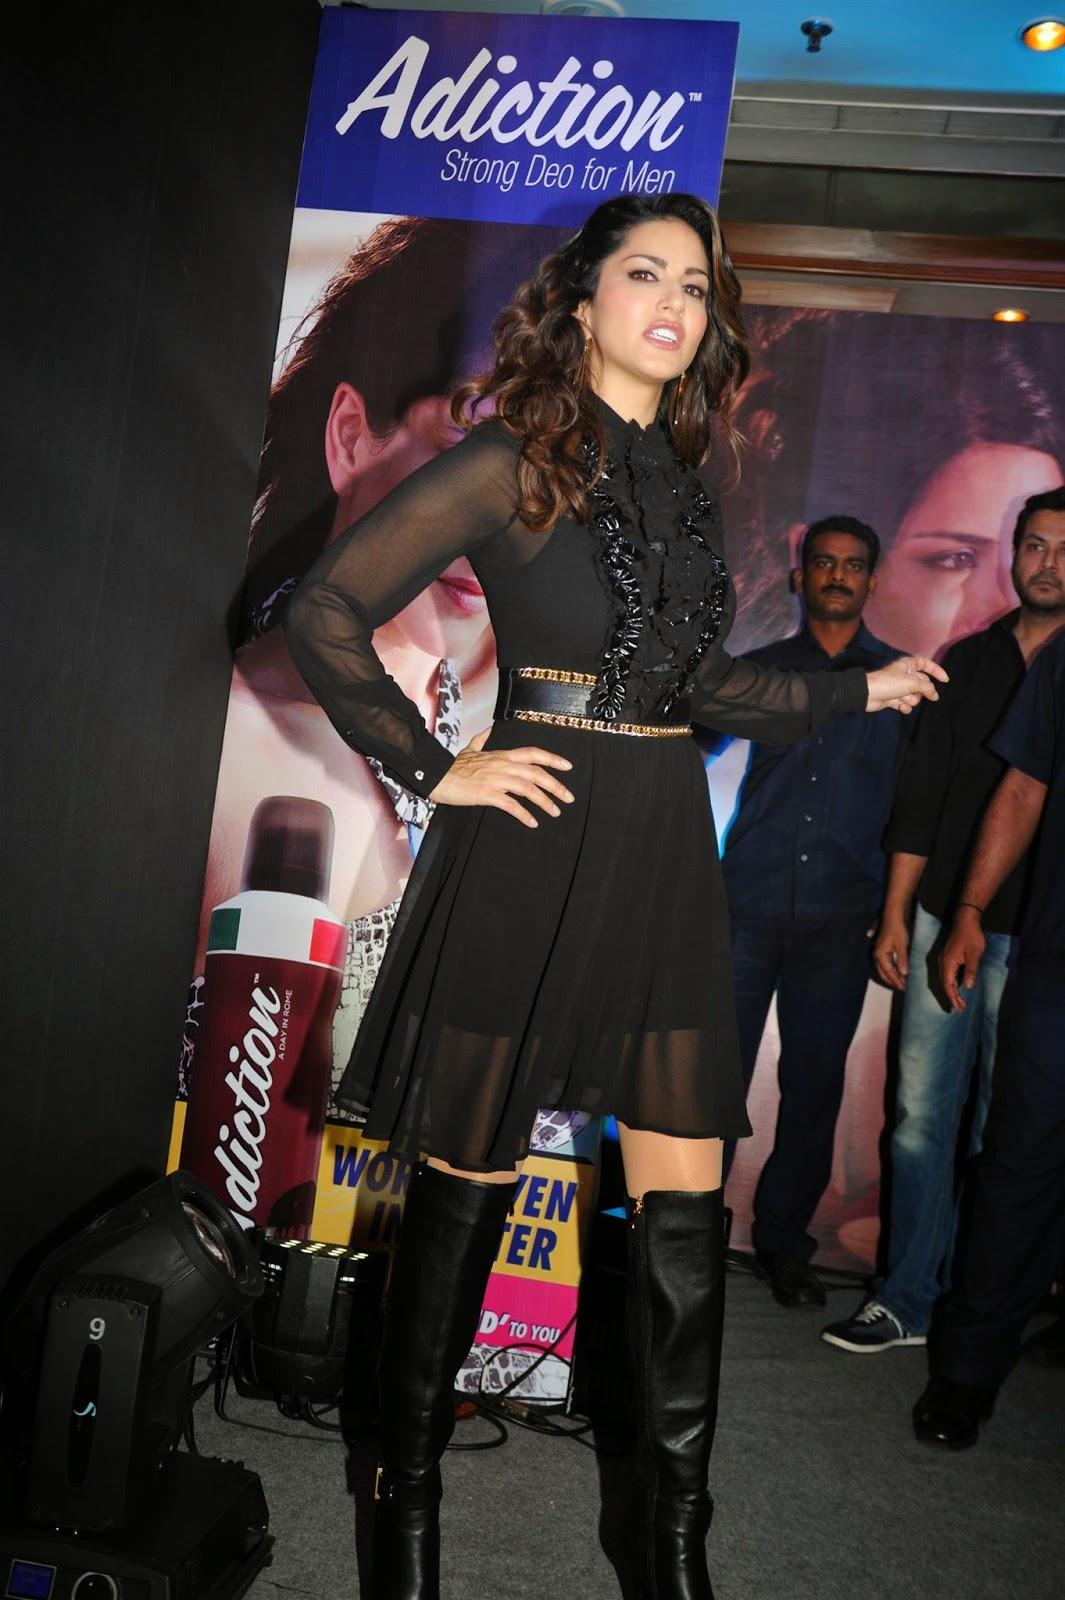 Sunny Leone at Mankind Pharma's Adiction Deo Contest Photos